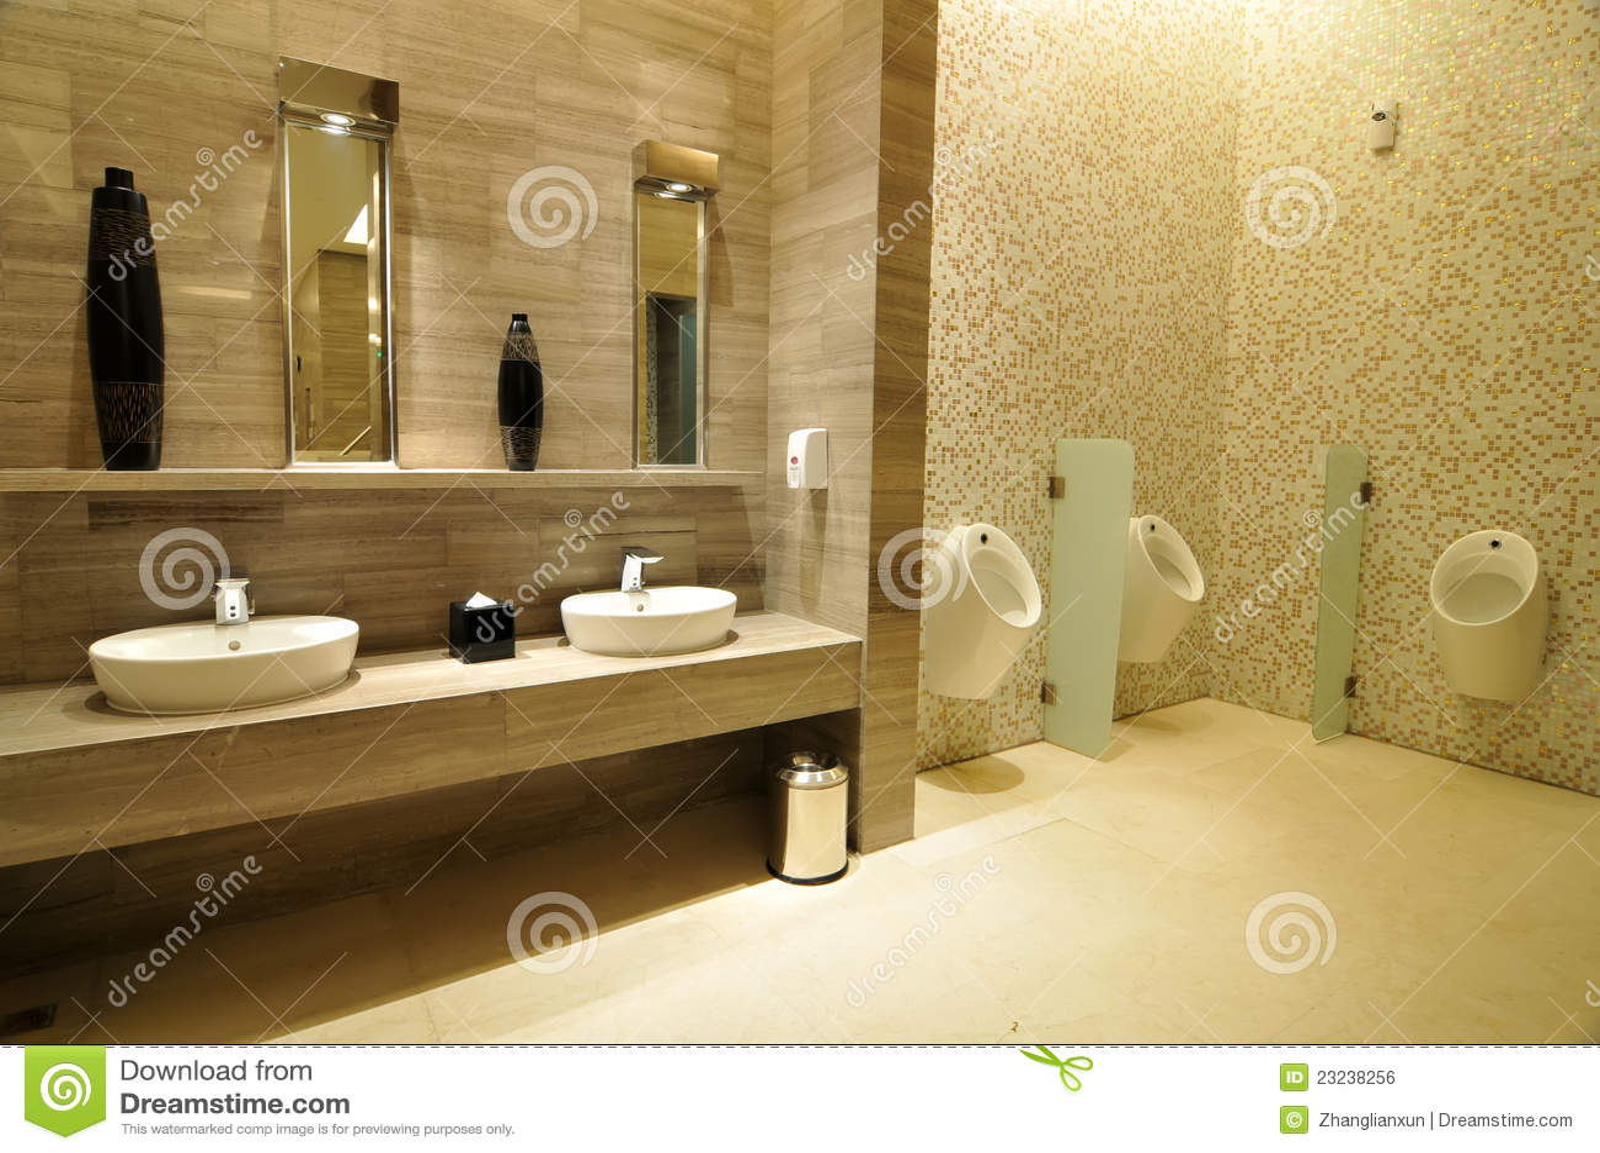 luxury bathroom royalty free stock image - image: 23238246